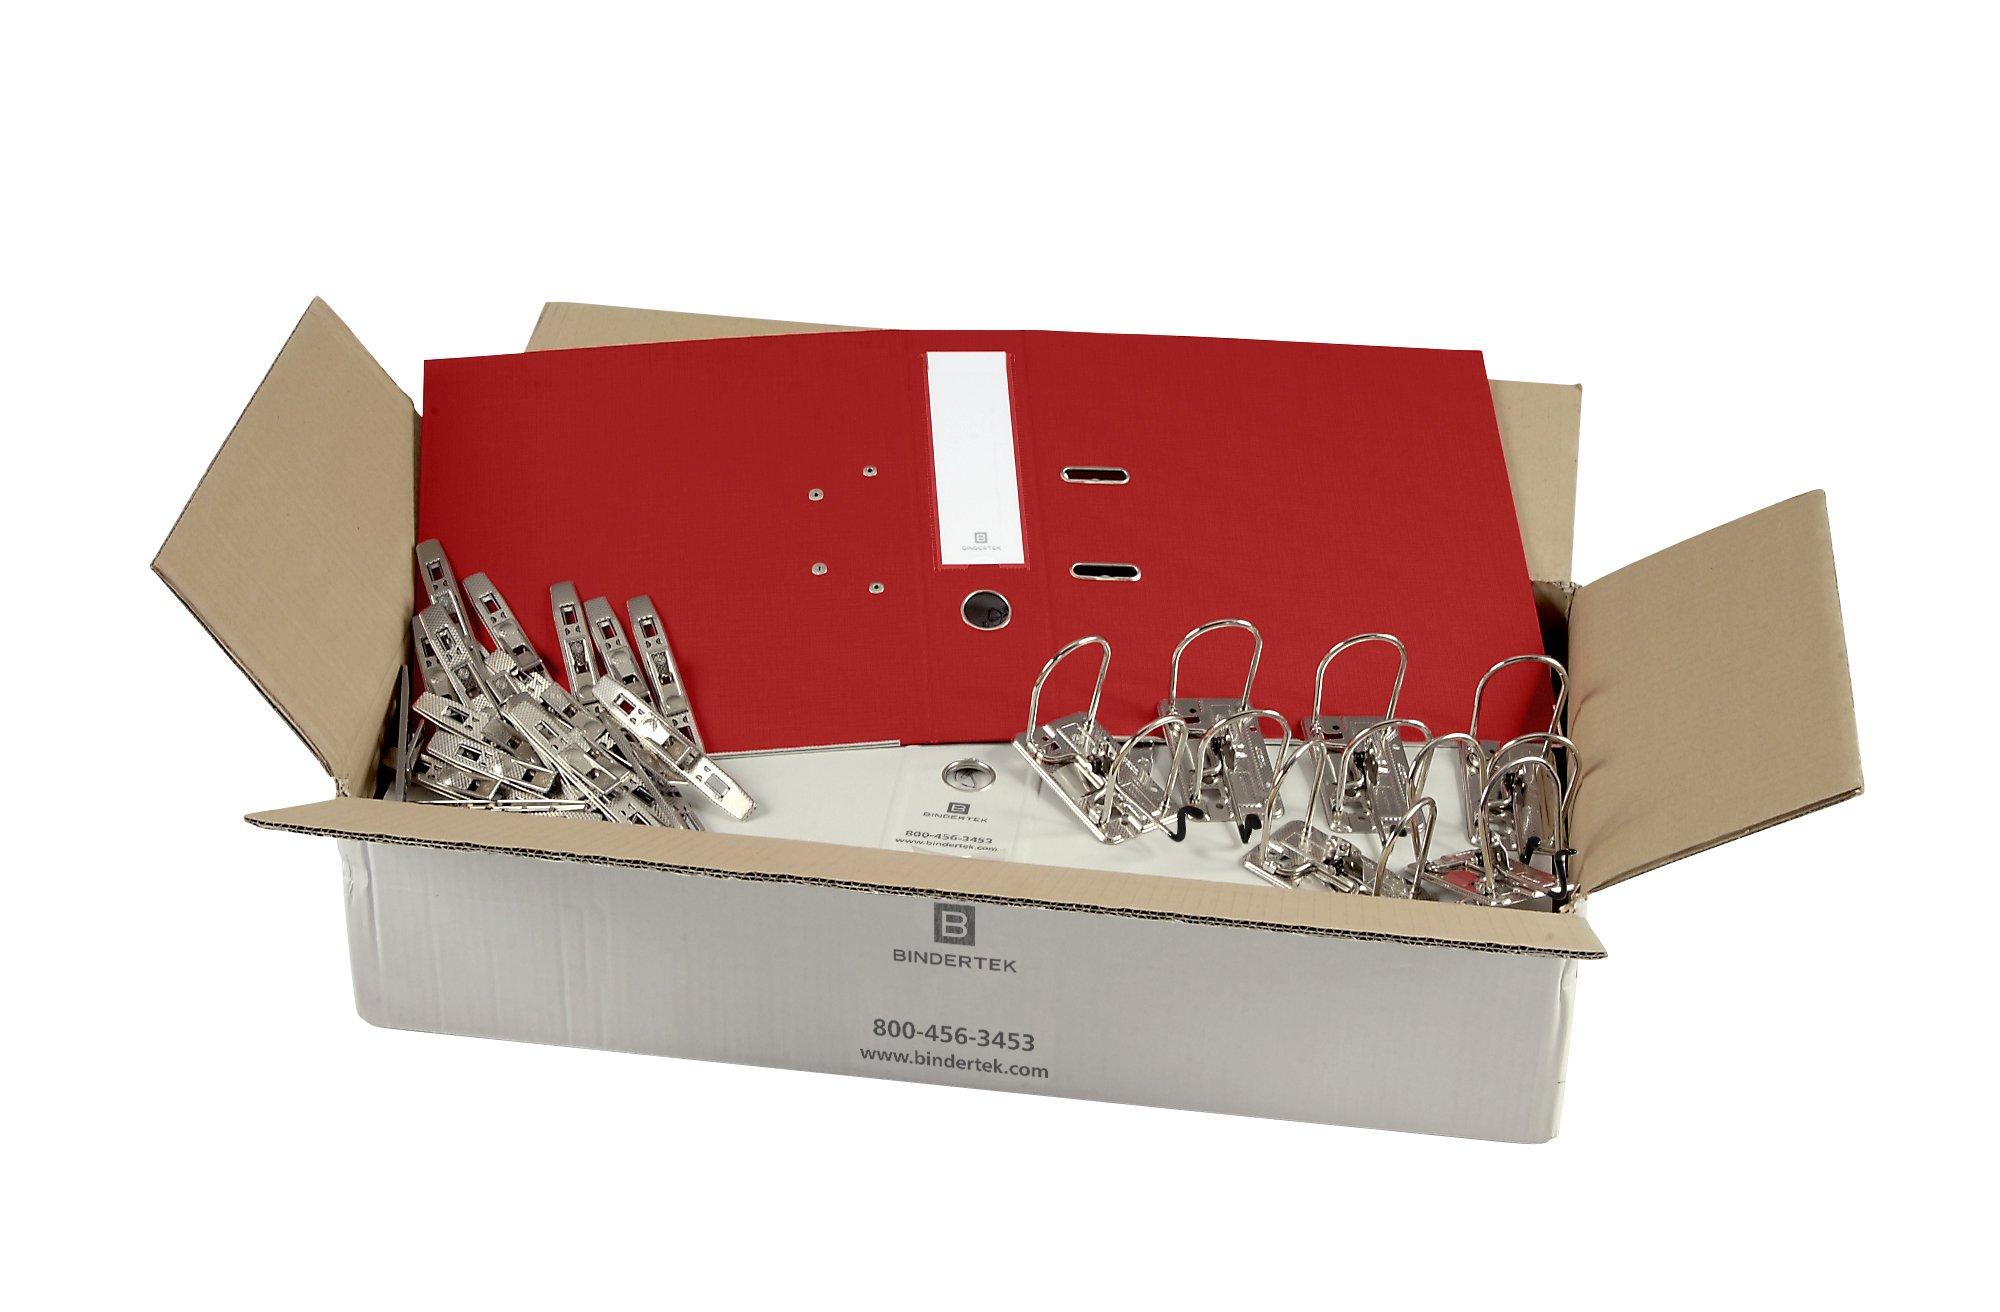 Bindertek 2-Ring 3-Inch Unassembled Premium Binder Packs, Red